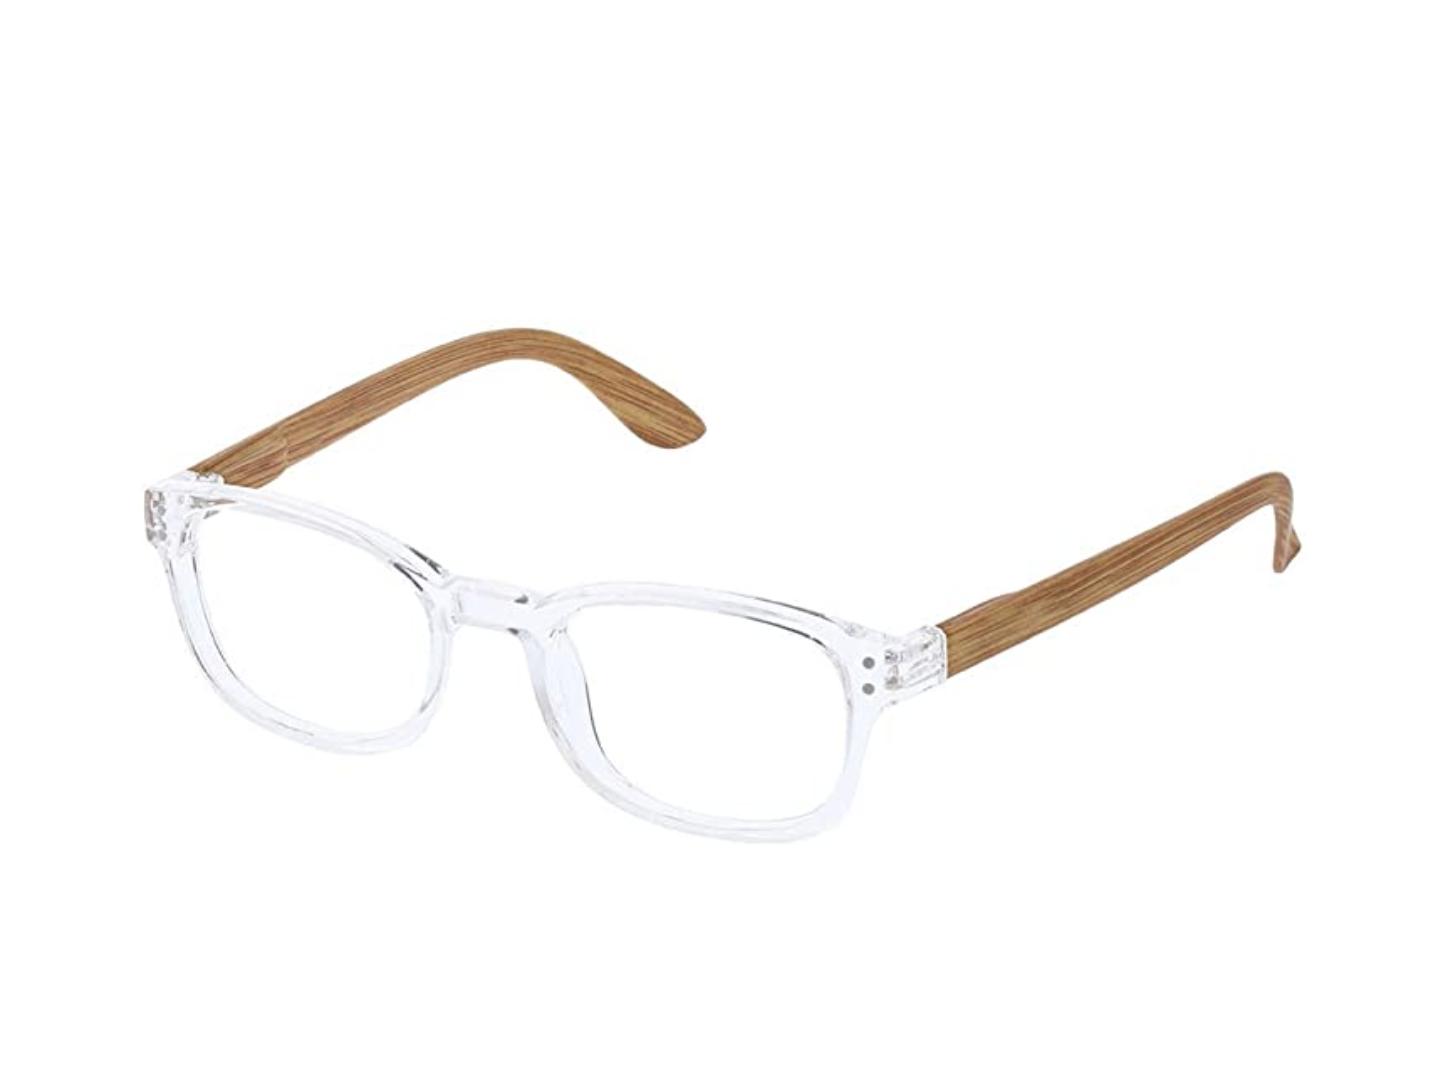 Stylish Reading Glasses - PeeperSpecs